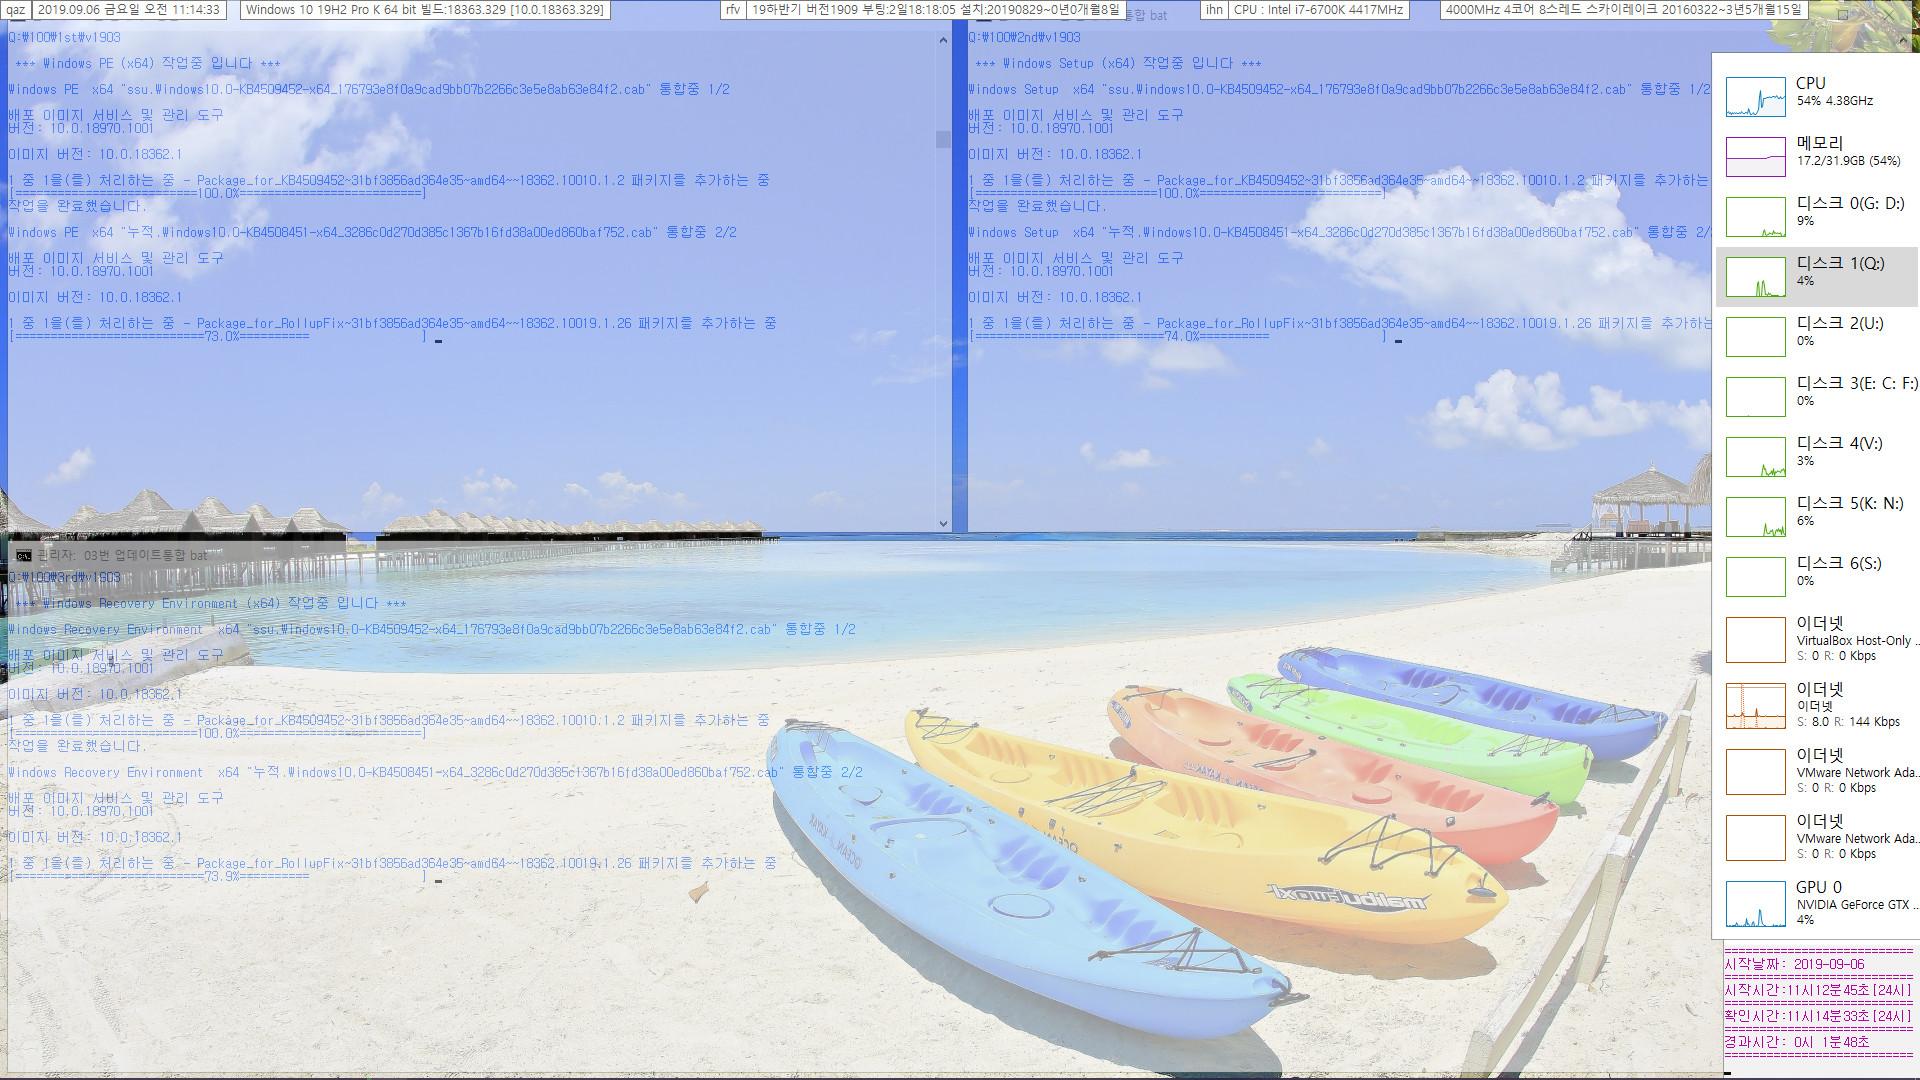 Windows 10 19H2 인사이더 프리뷰 KB4508451 누적 업데이트 (OS 빌드 18362.10019) [2019-09-05 일자] 나왔네요 [슬로우 링] - 프로 64비트 통합중 입니다 - boot.wim과 winre.wim 2019-09-06_111433.jpg